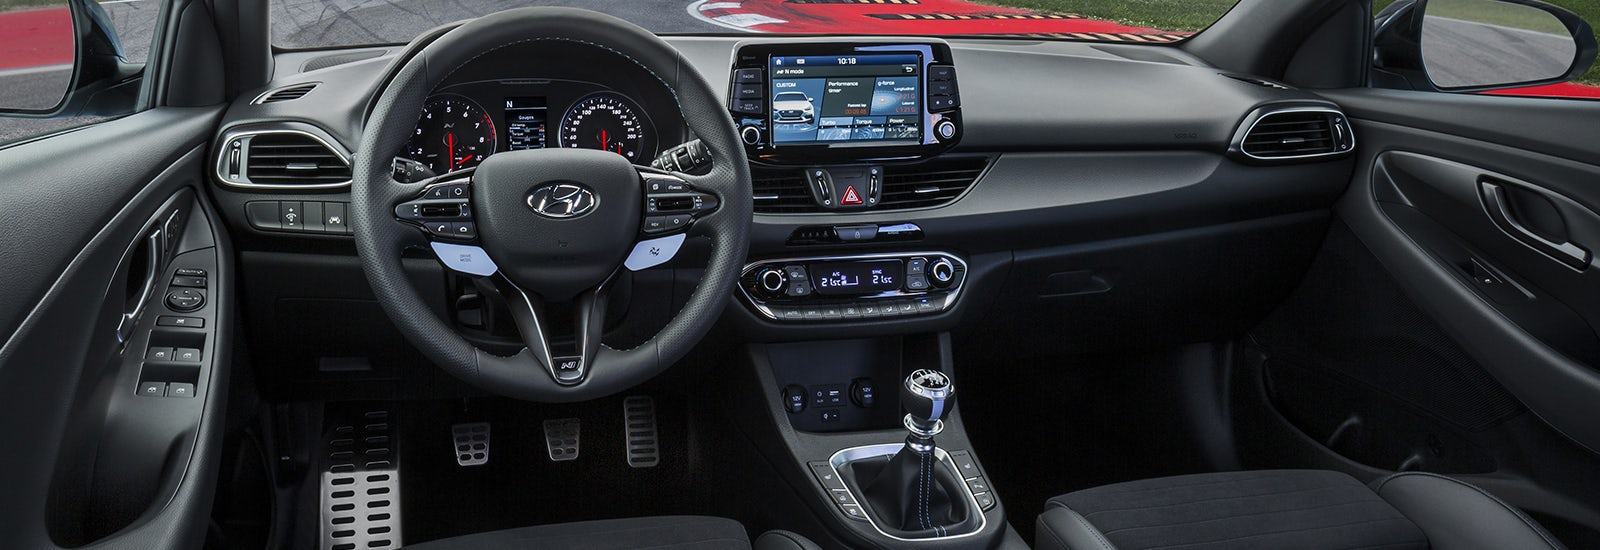 Hyundai i30 n hot hatch price specs release date carwow for Interior hyundai i30